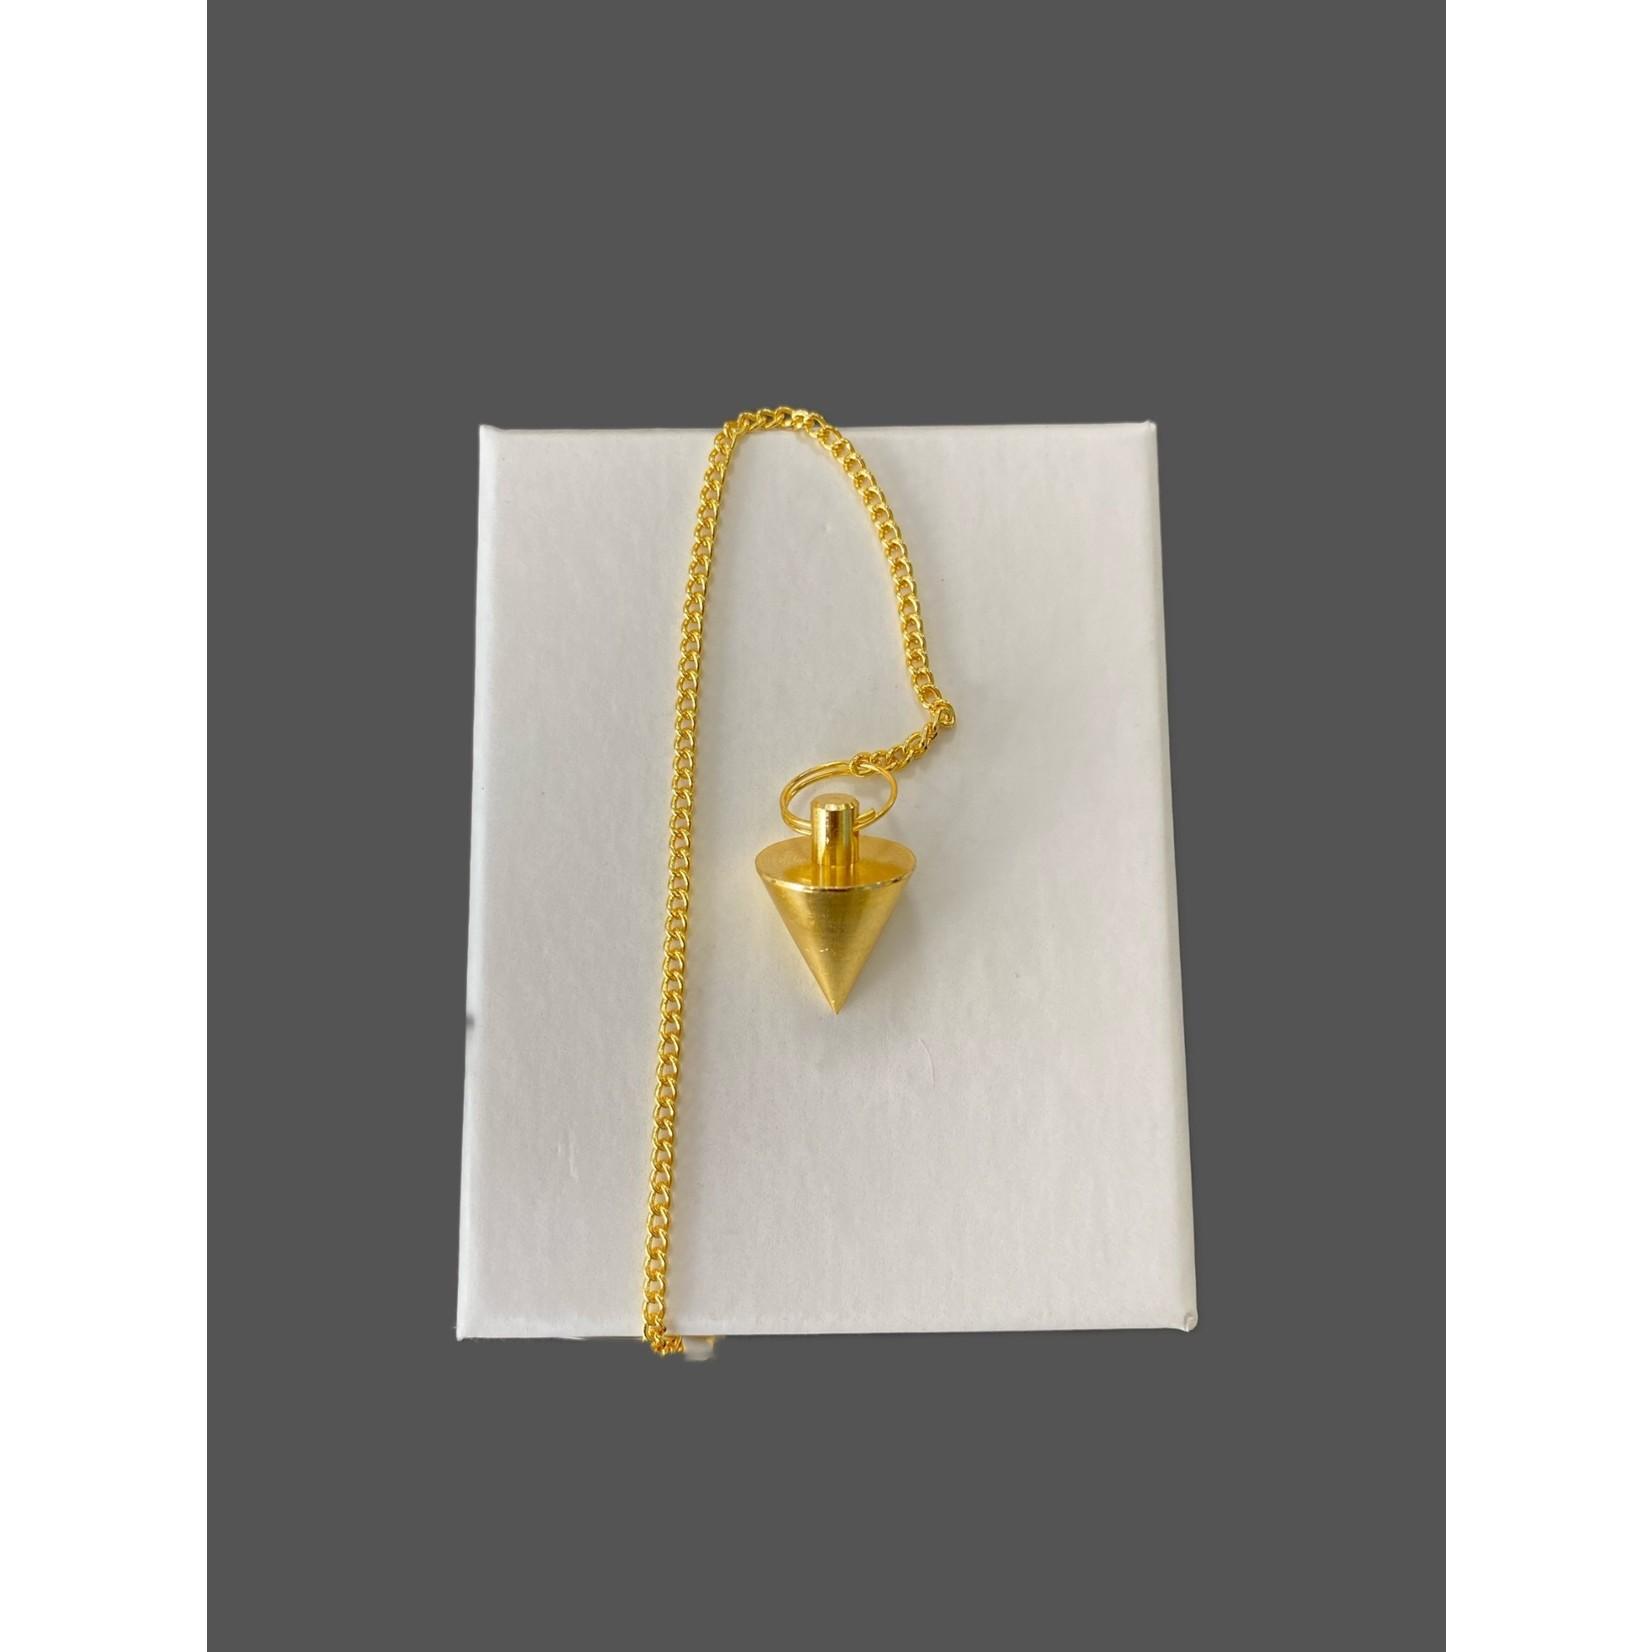 Pendulo cónico metálico peq. bronce